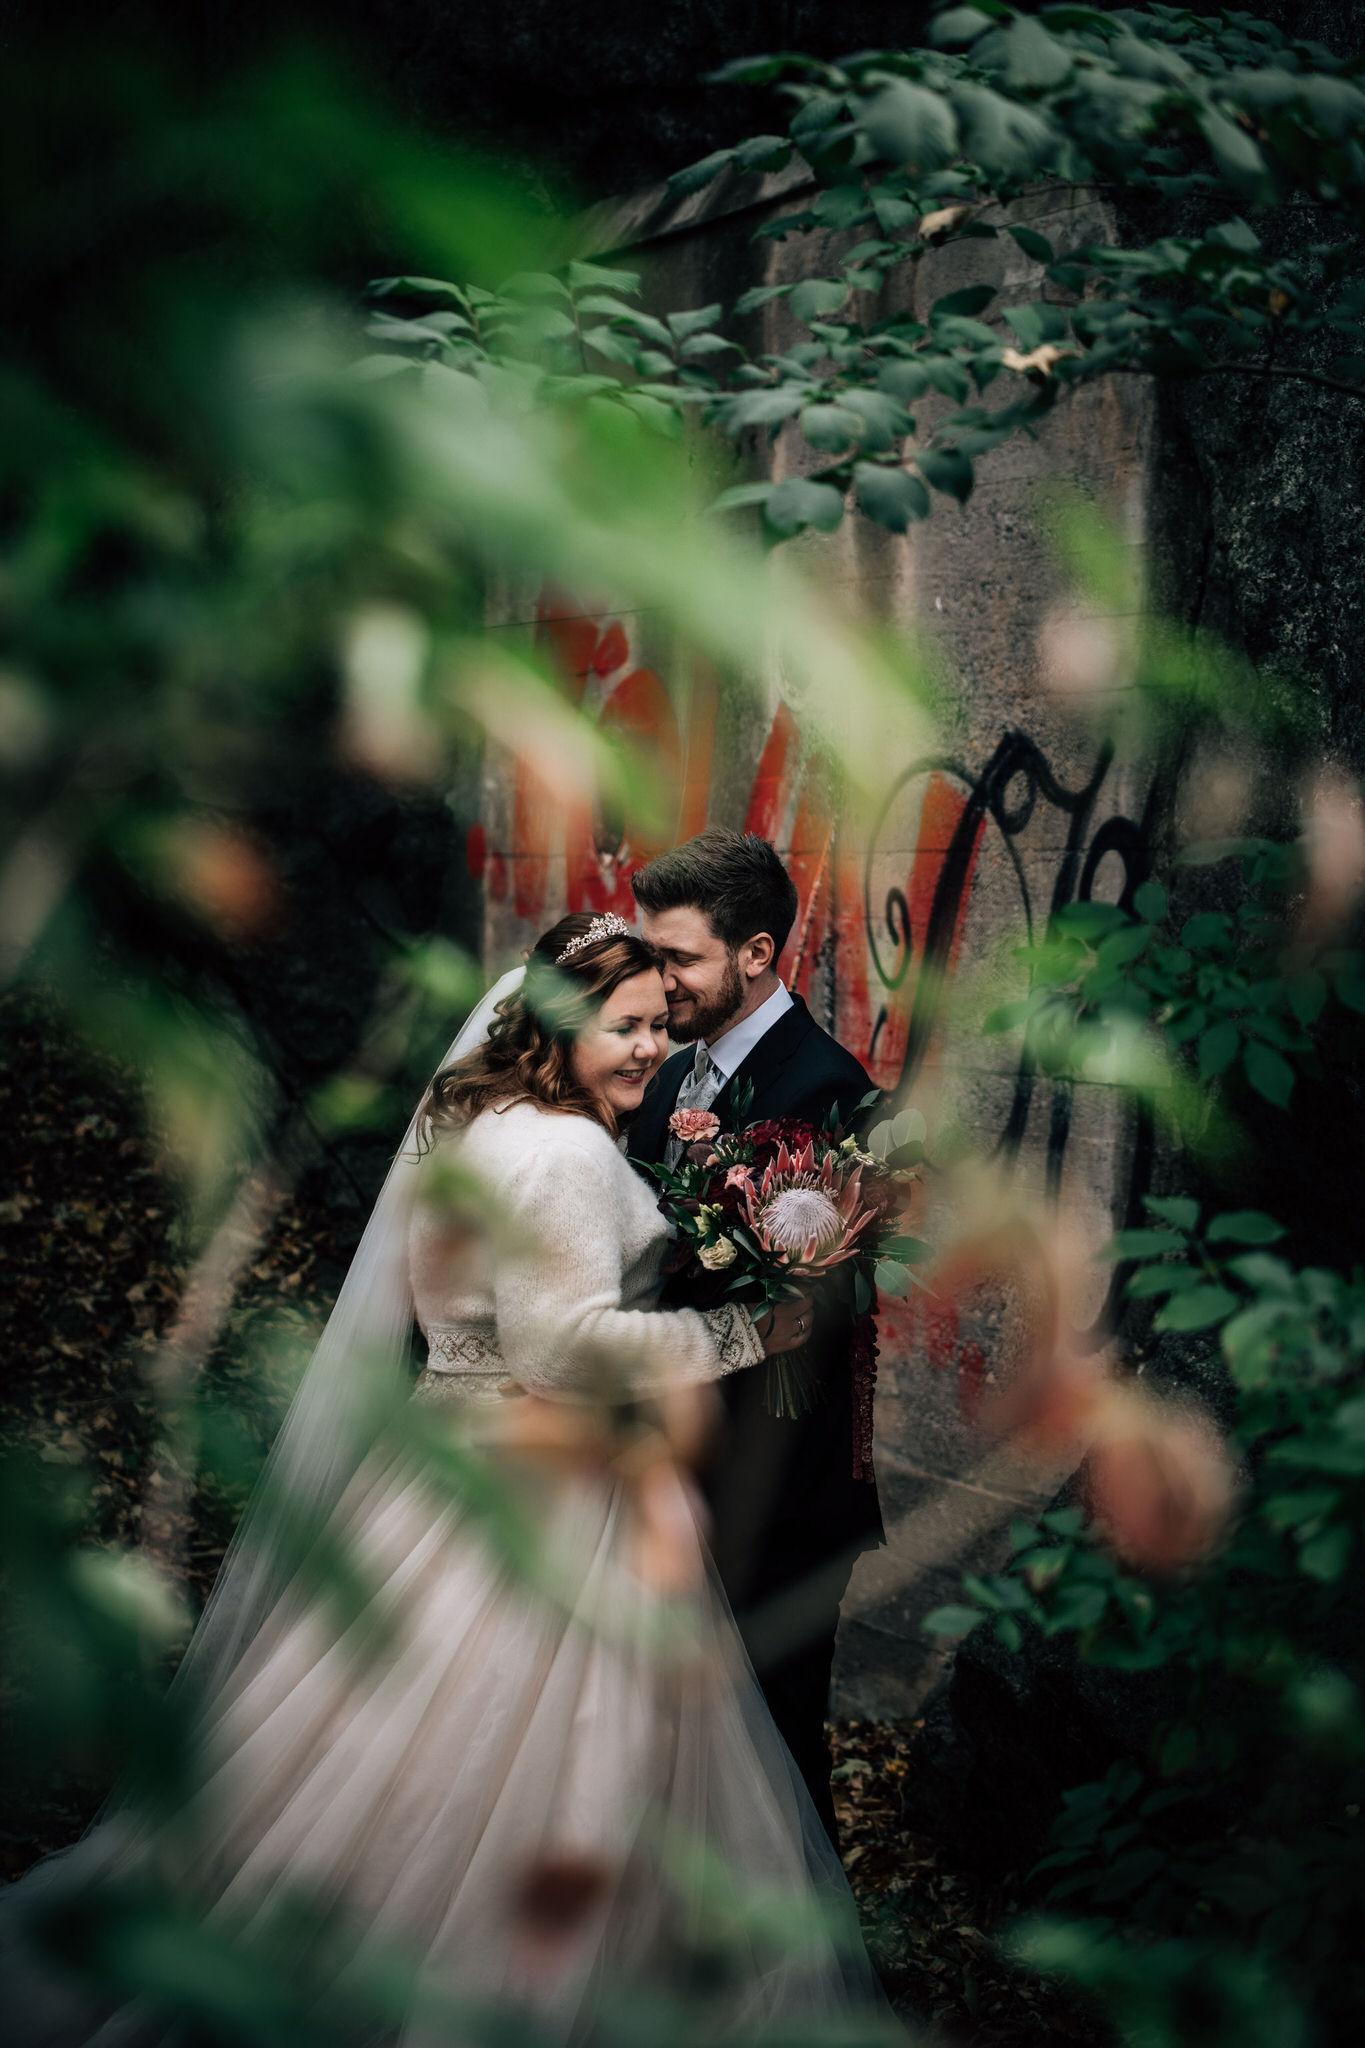 _N857929_fotografering_larvik_bryllup_aspargesgarden_.jpg